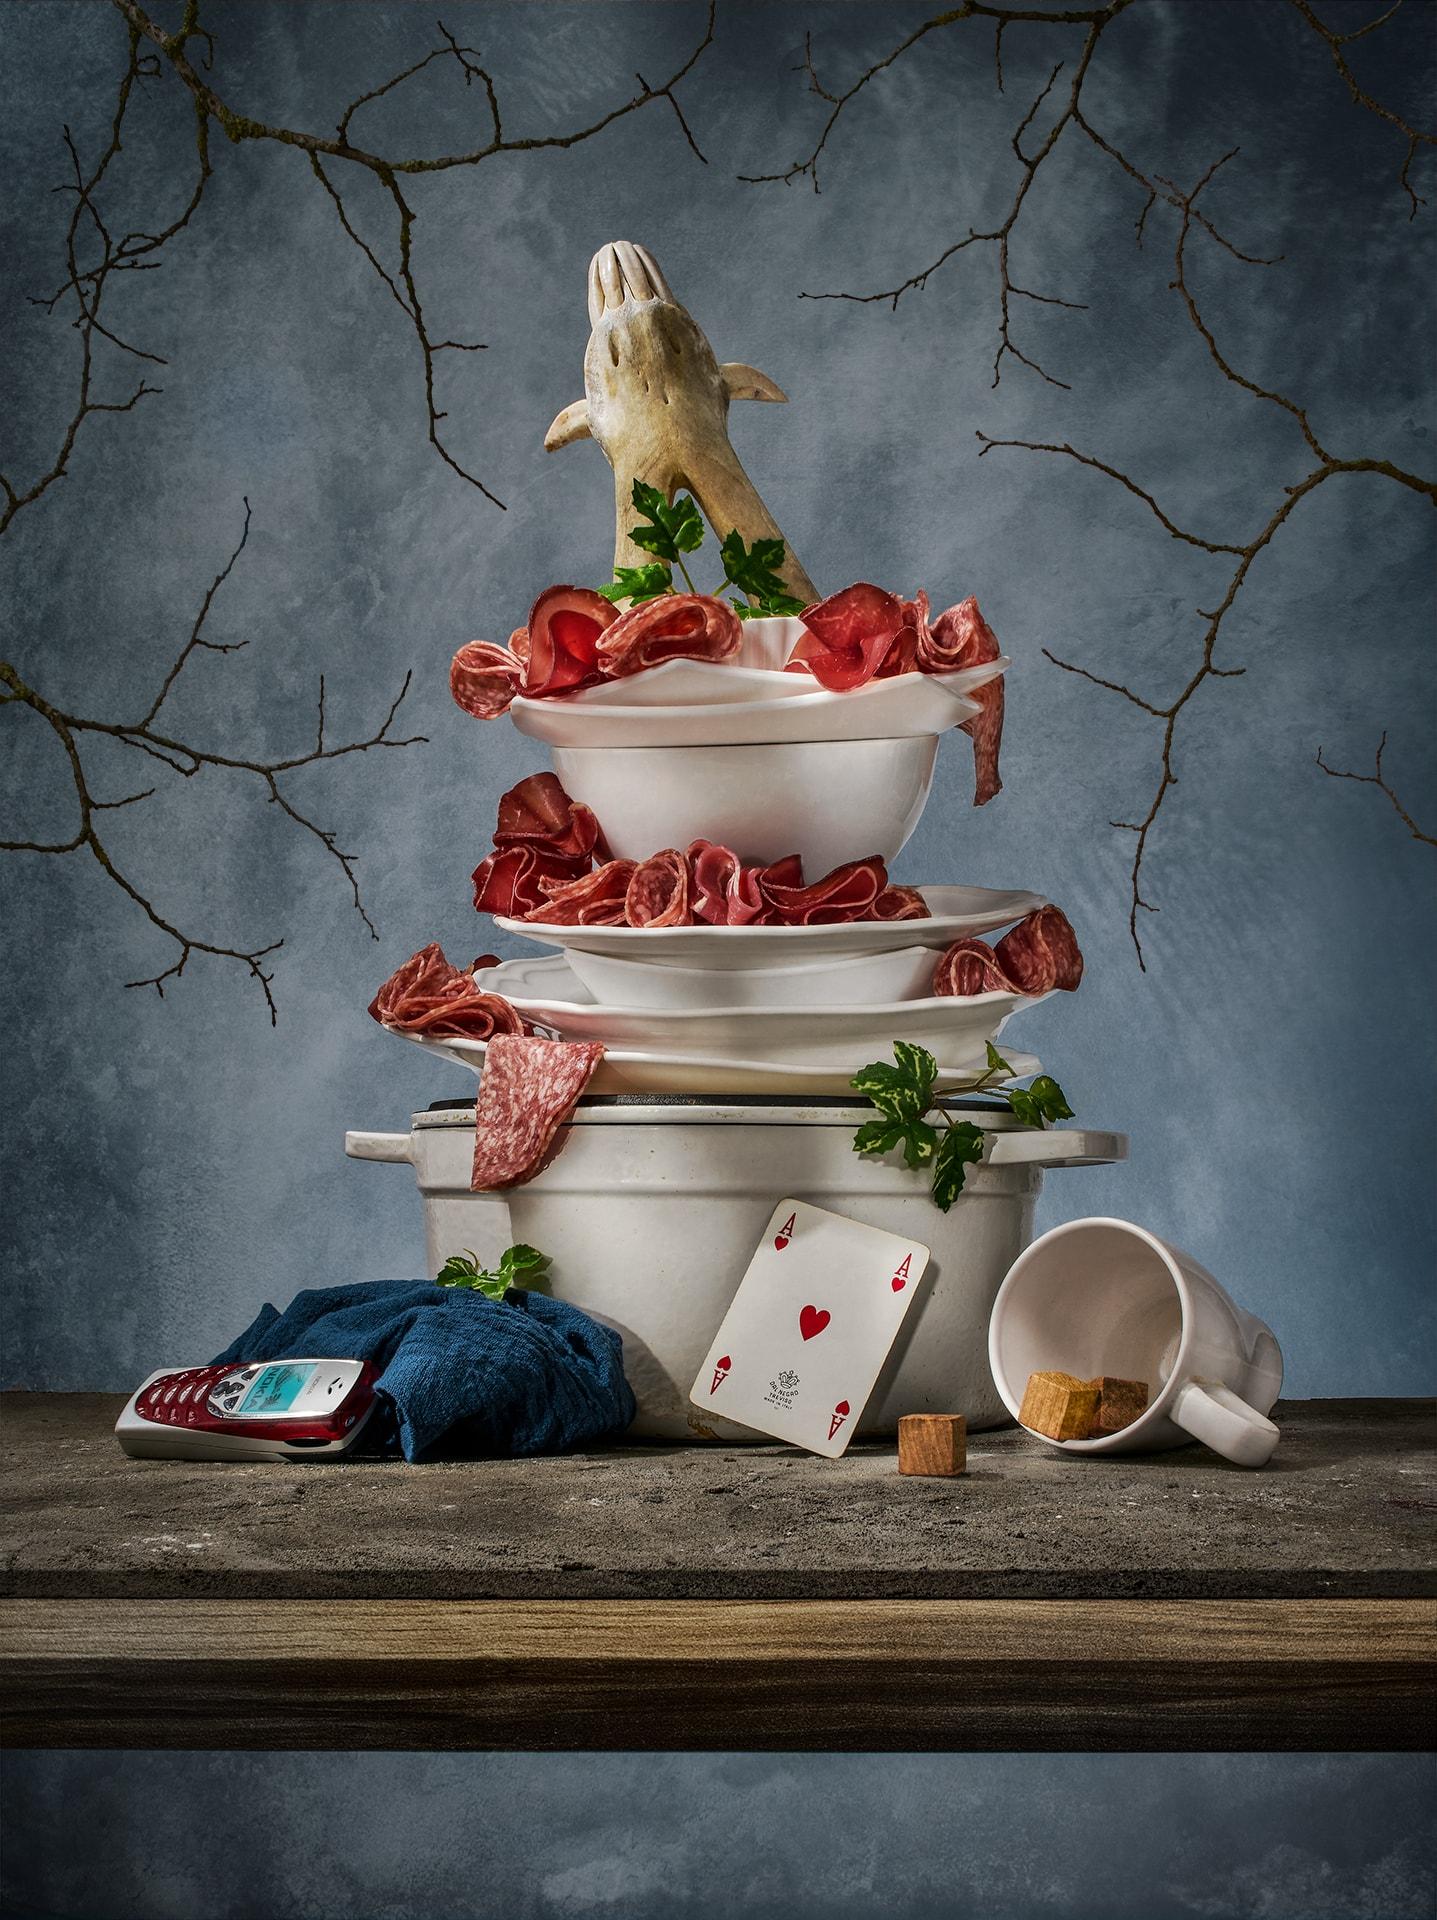 Award winning fine art photographer - food photography - Modern Old Salami - wedding cake - salumi - salami - bresaola - salame - speck - prosciutto - conceptual - San Daniele - Parma - Jamon - Bologna - Modena - Sauris